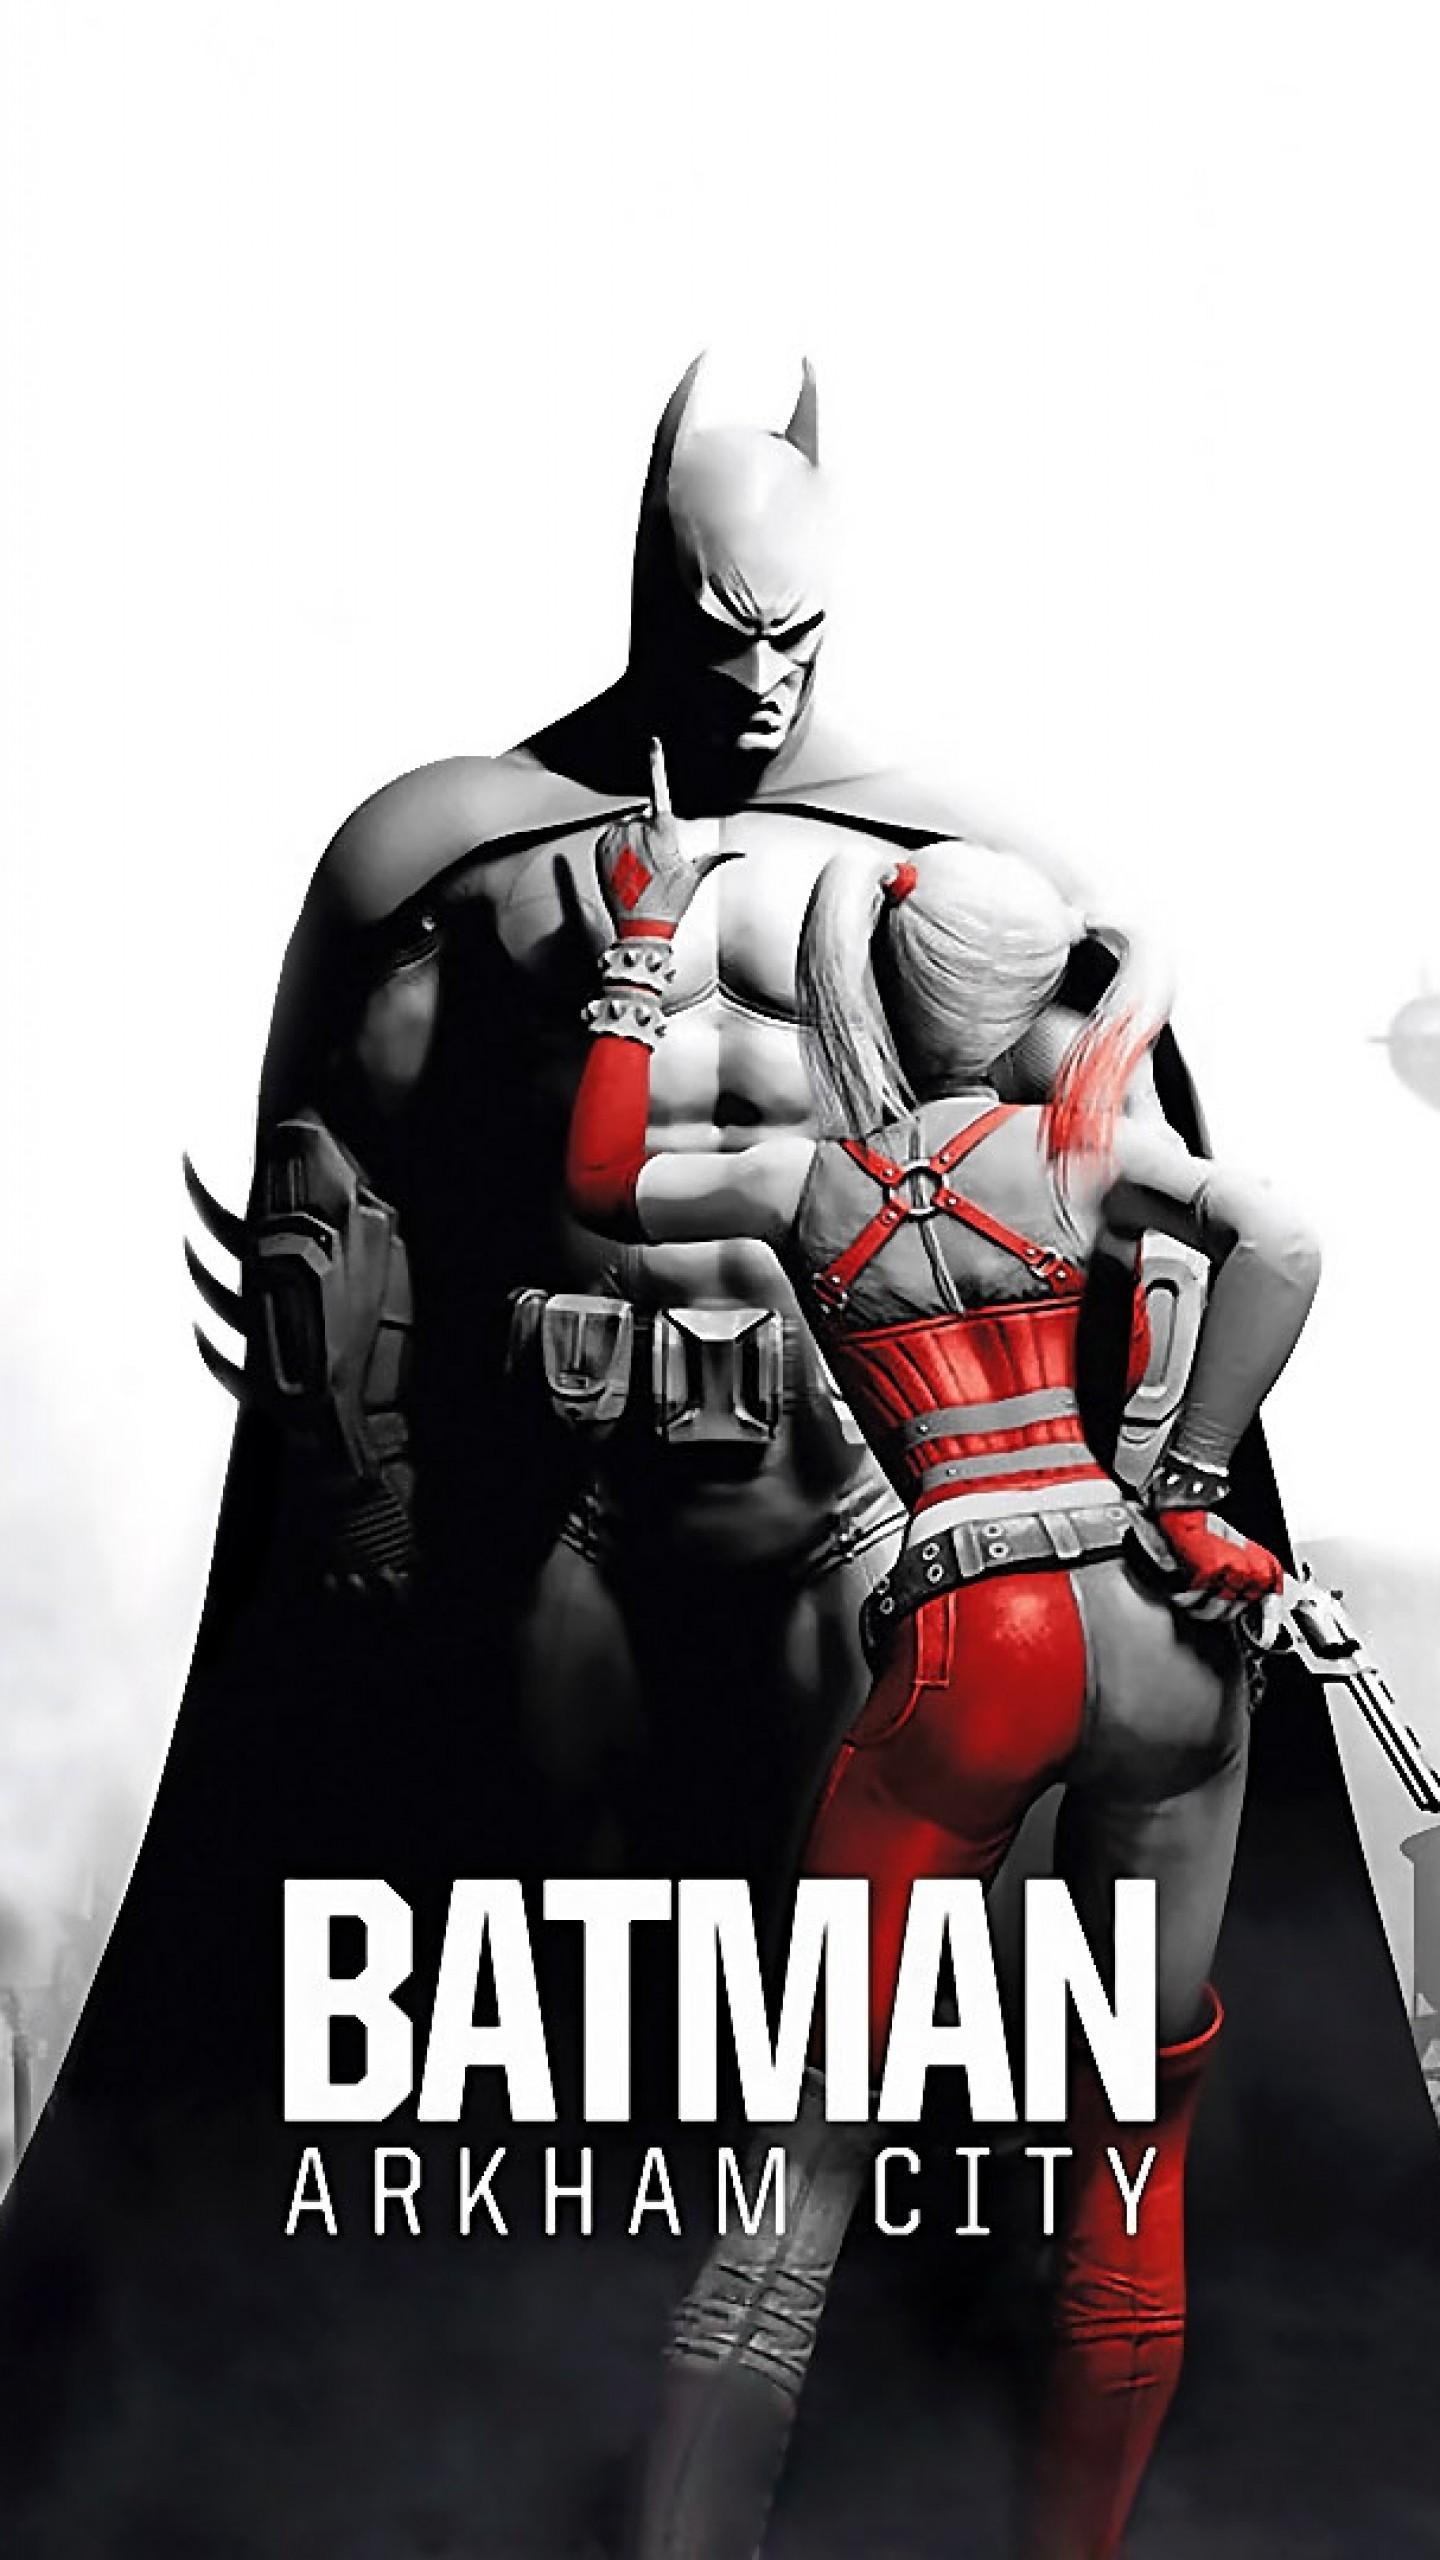 Preview wallpaper batman arkham city, characters, girl, pistol, city, black  and